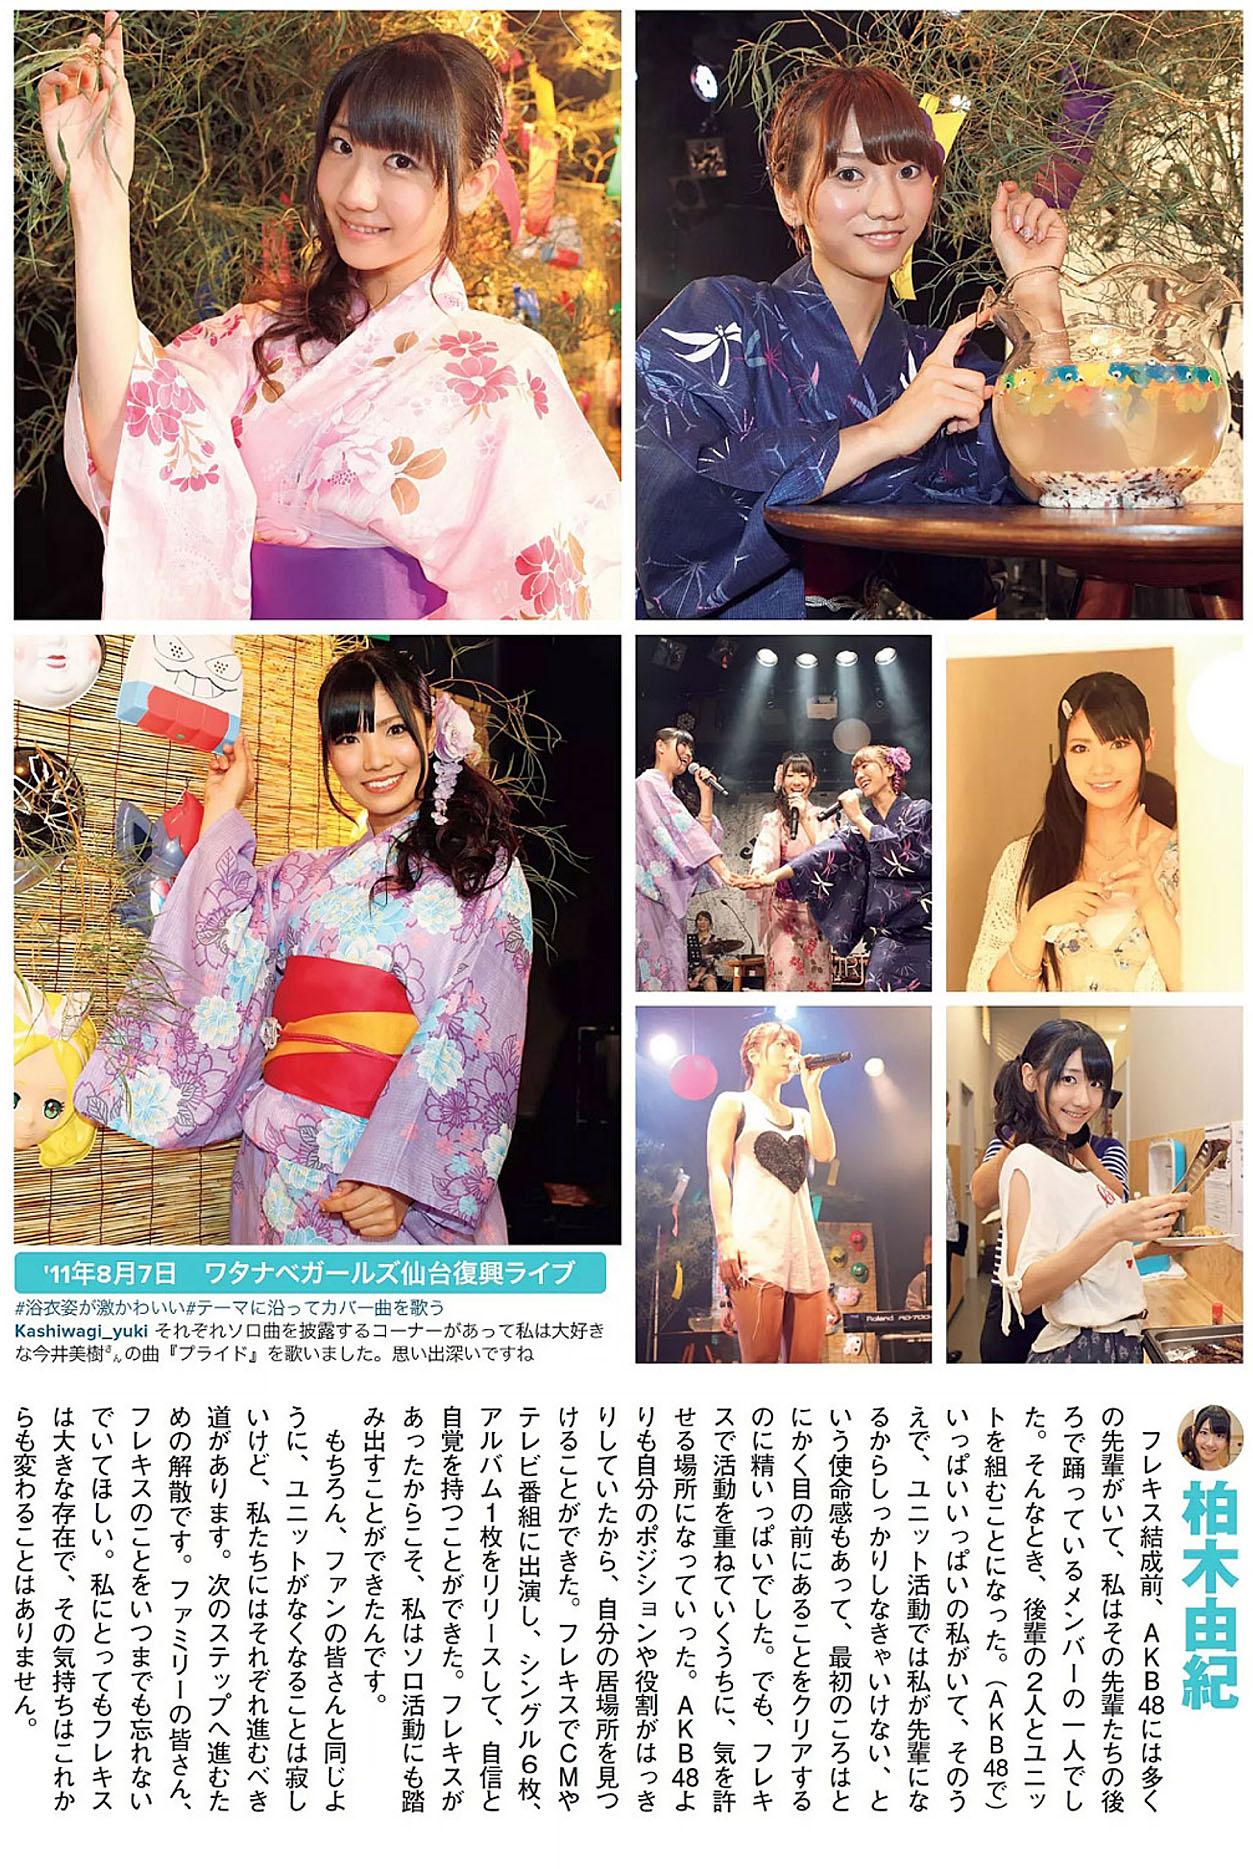 AKB48 French Kiss Flash 151124 09.jpg